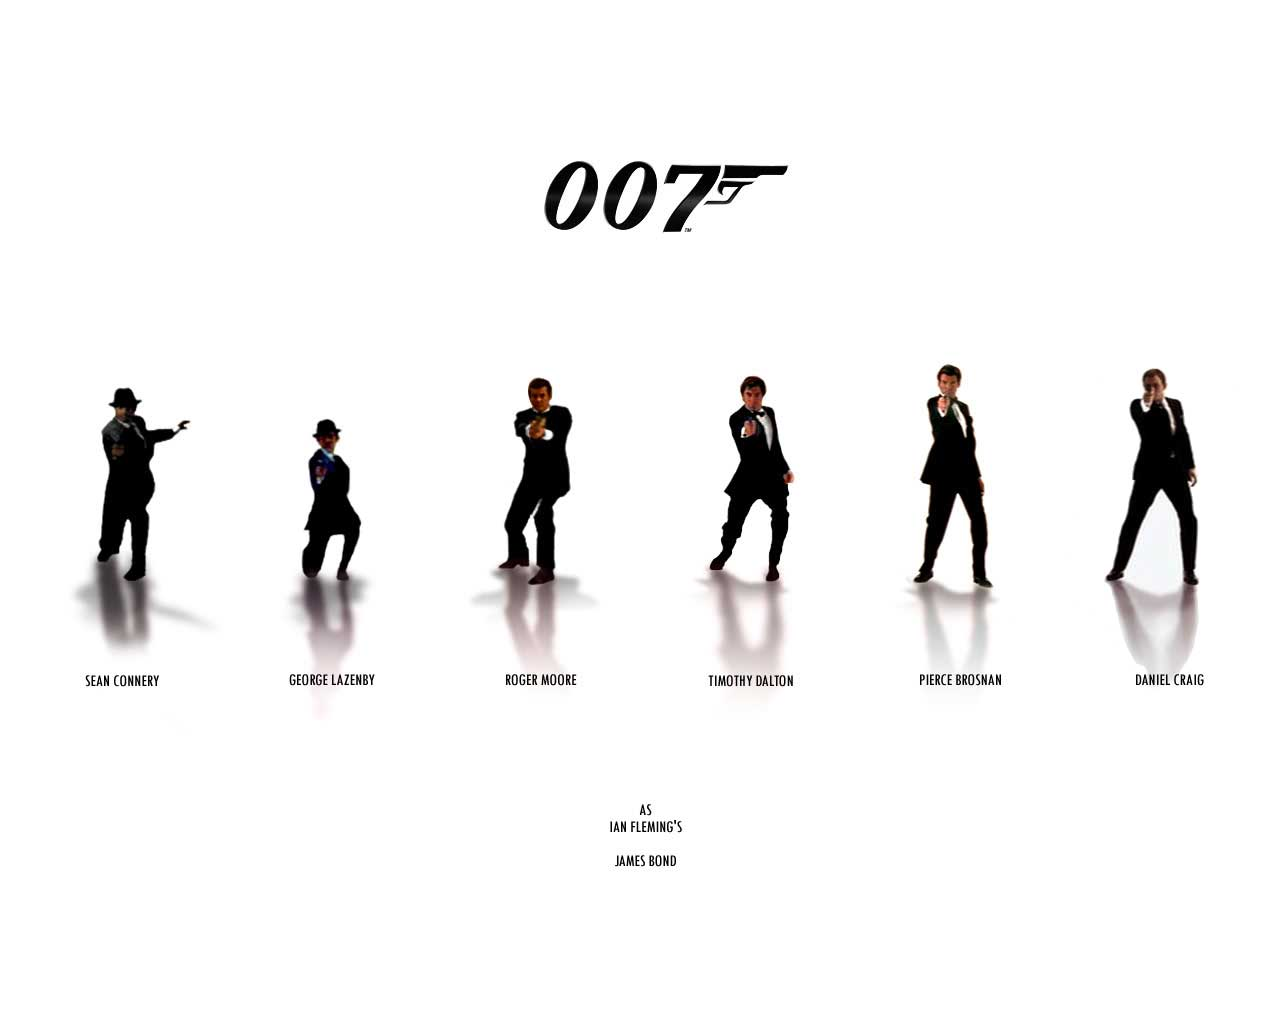 James Bond 007 Wallpaper 1280x1024